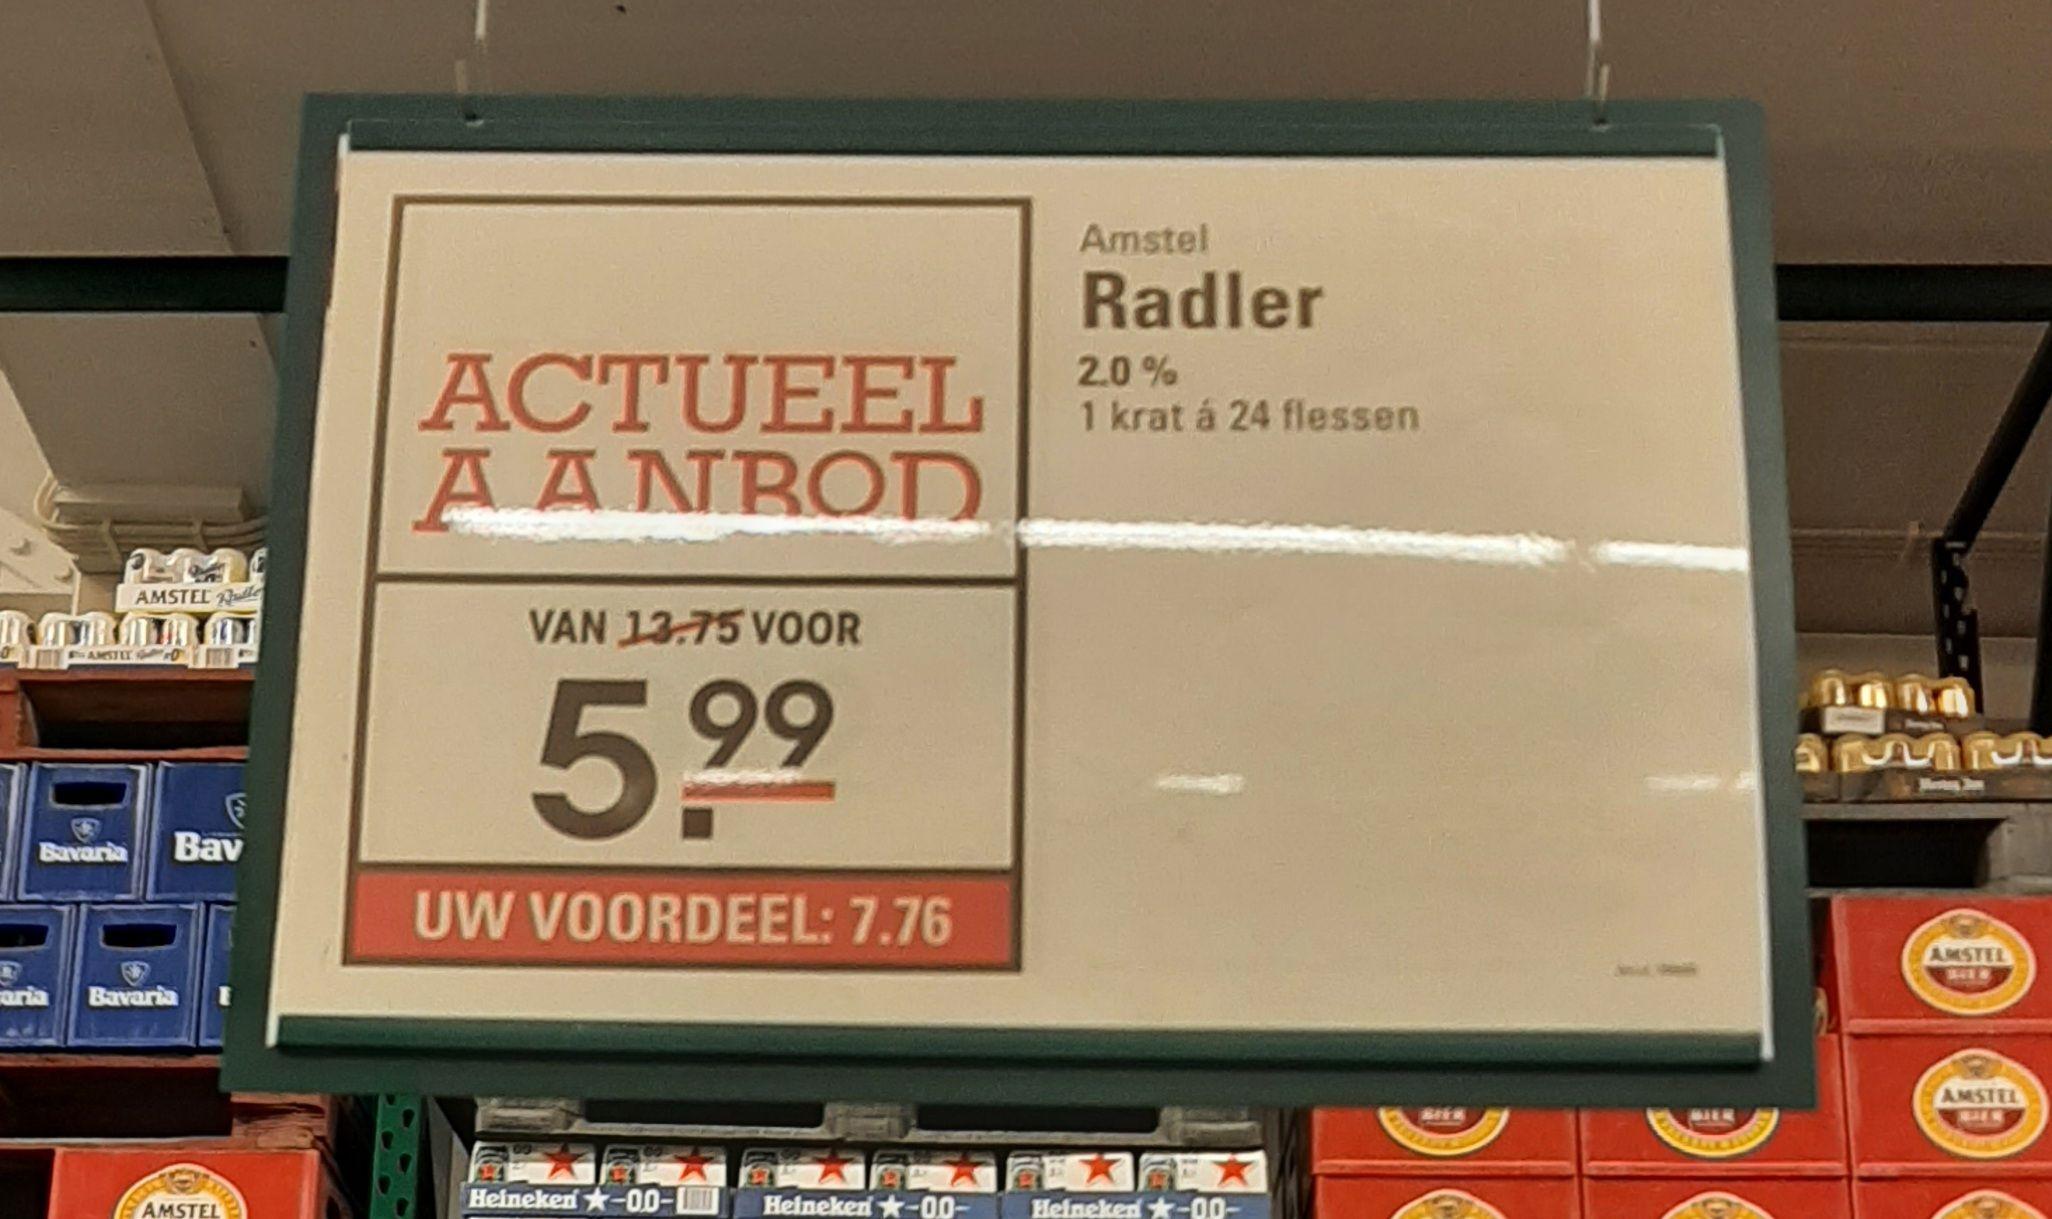 [Lokaal] Amstel Radler 2,0% Sligro Zwolle HH t/m 04-2021